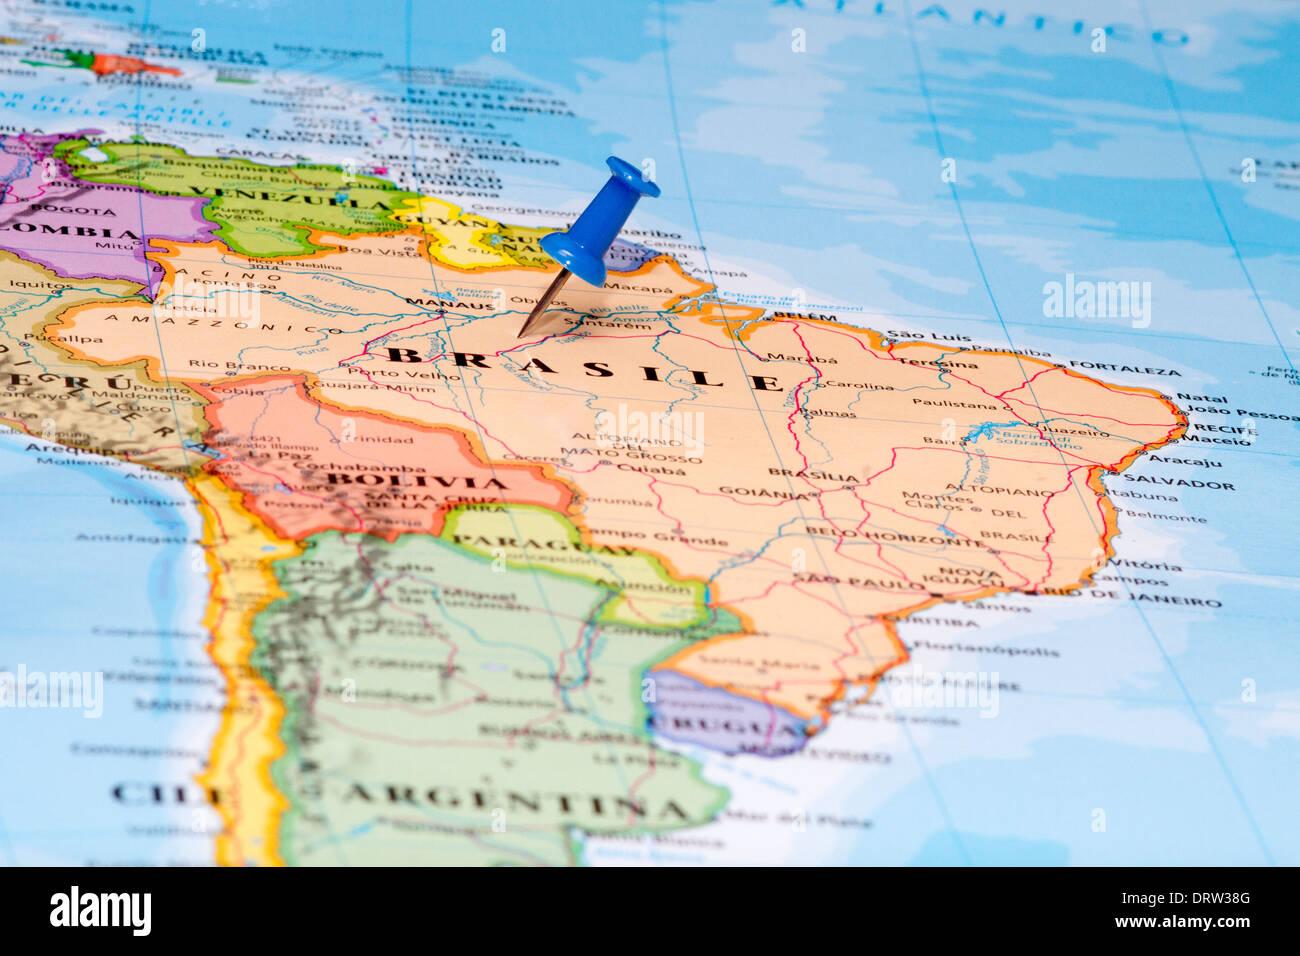 América Latina Map Stock Photos & América Latina Map Stock ... on caribbean map, spain map, asia map, culture map, puerto rico map, world map, peru map, nature map, australia map, africa map, estados unidos map, mexico map, general map, environment map, middle east map, deutschland map, bangladesh map, europe map, colombia map, amazon map,